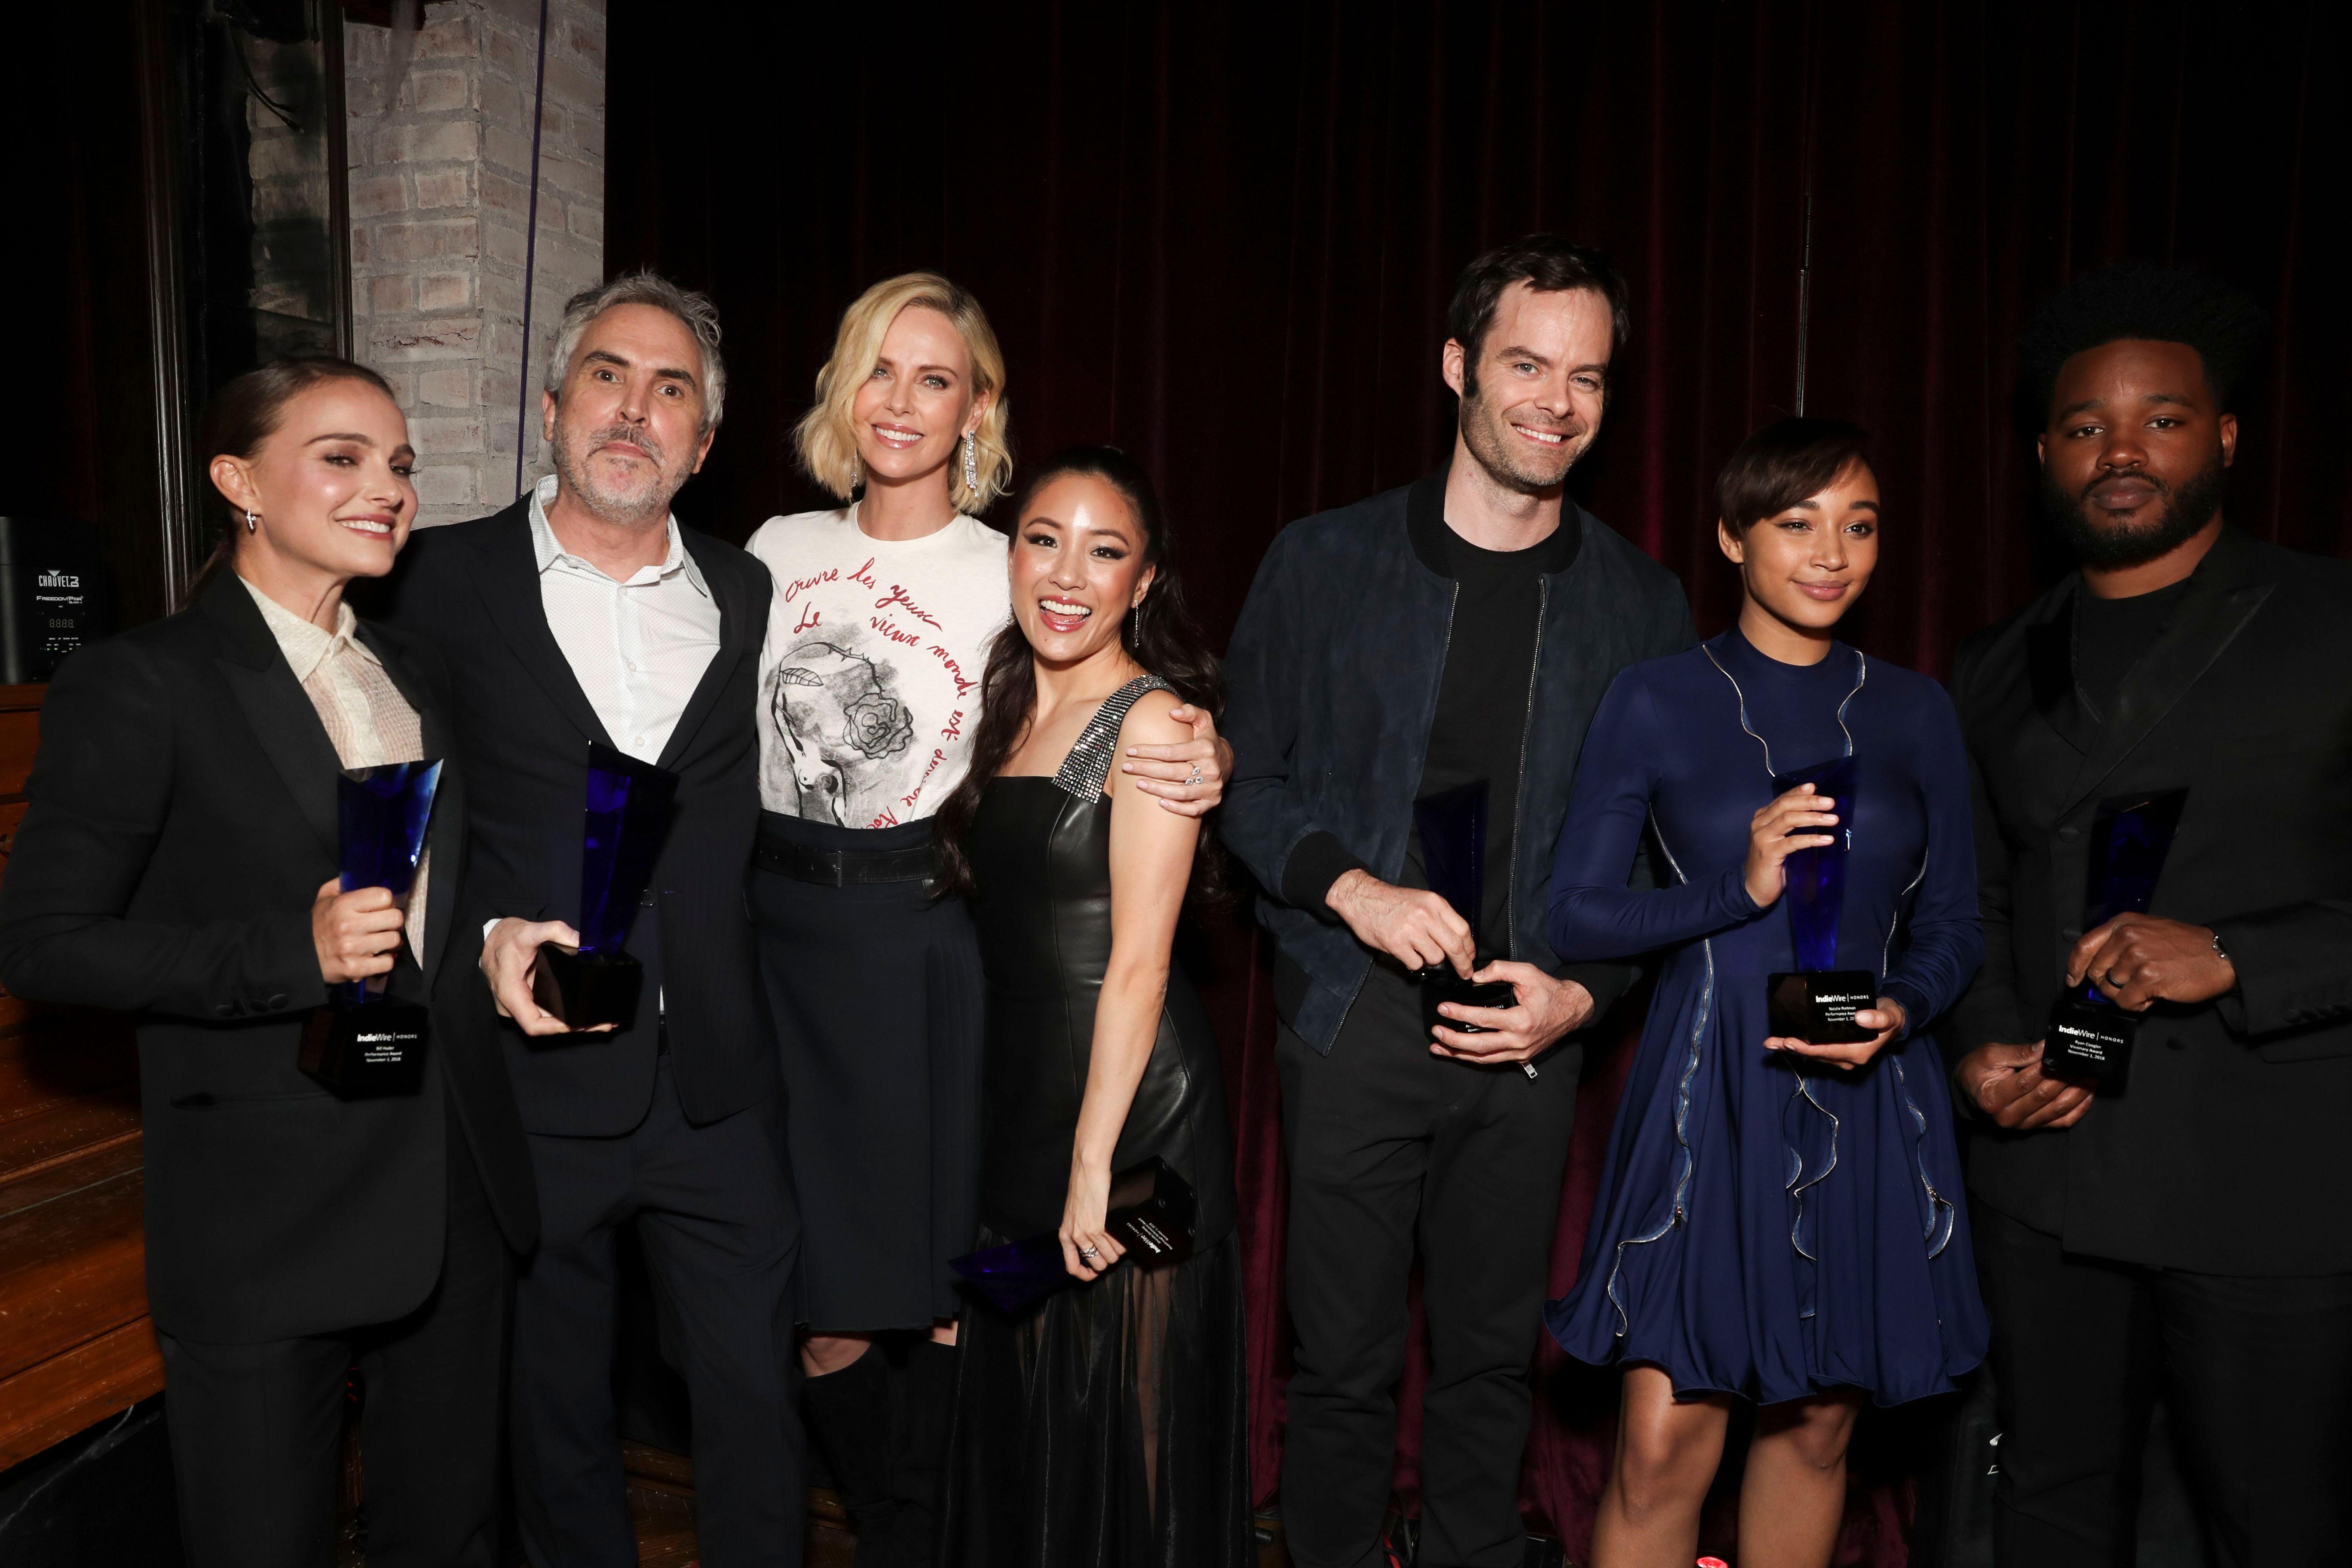 IndieWire Honors: Bill Hader Calls to Save FilmStruck and Cary Fukunaga Quotes 'Boogie Nights' at Awards Ceremony